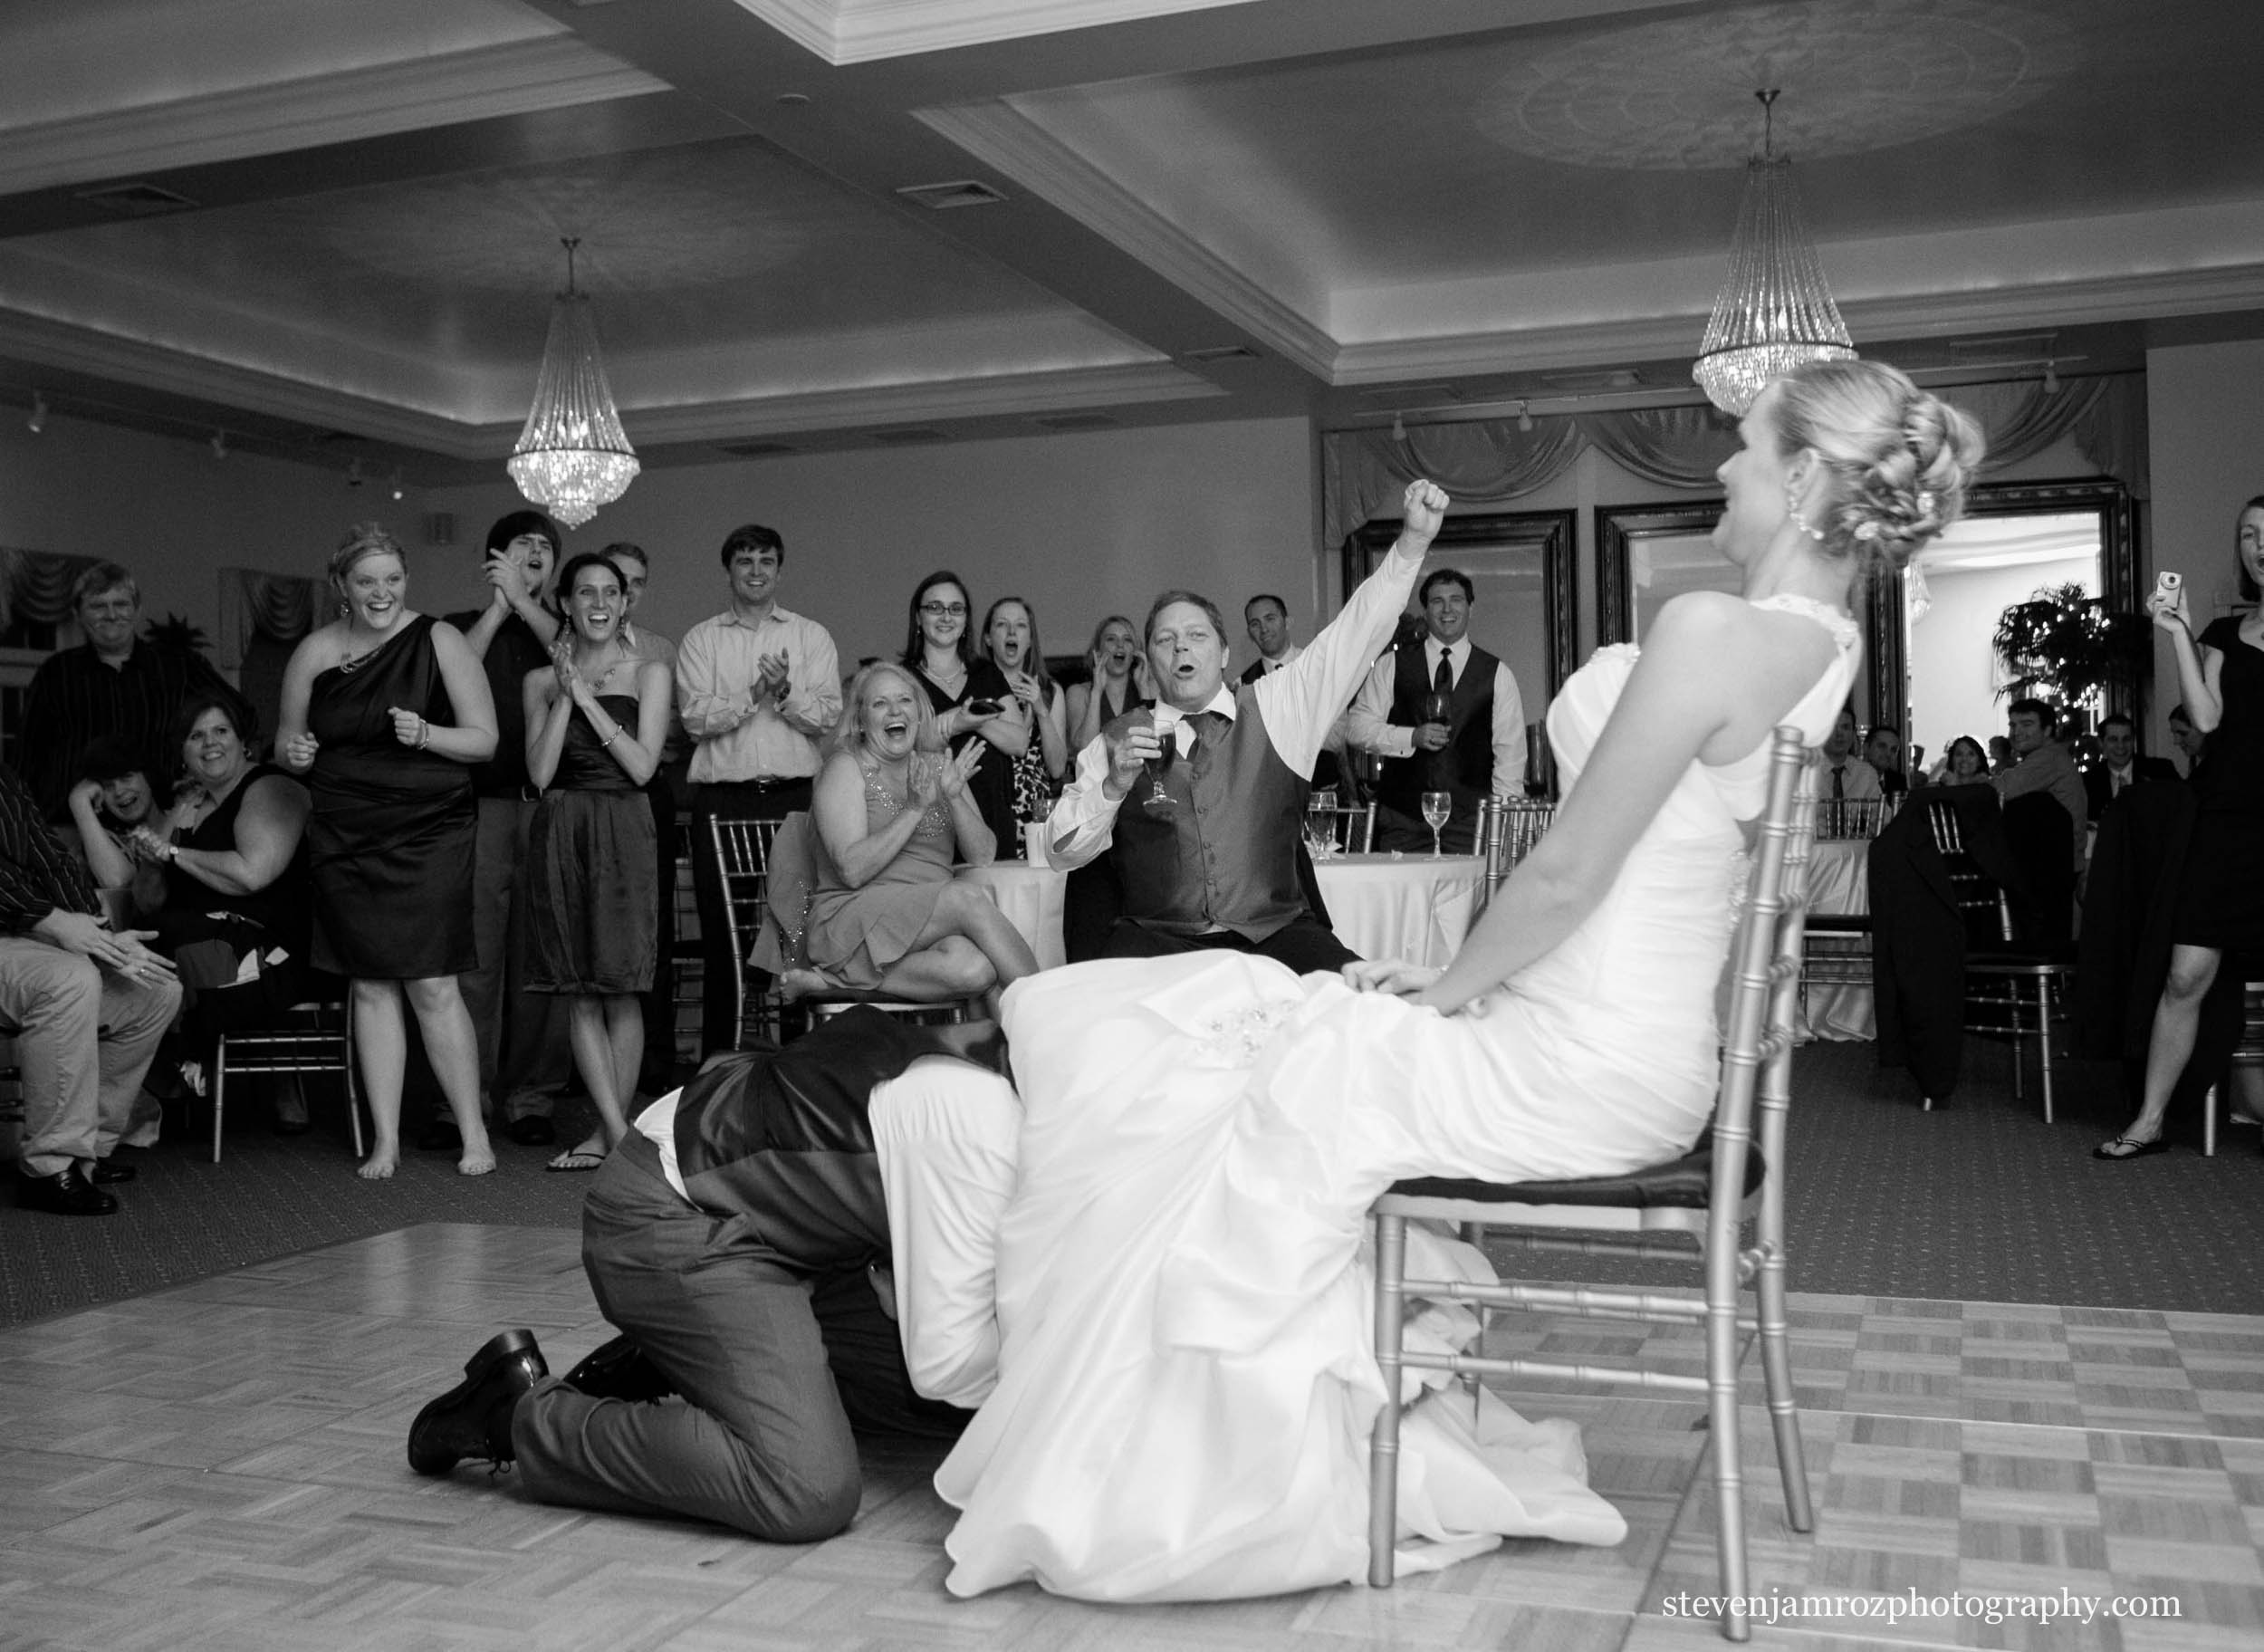 hudson-manor-estate-wedding-reception-photographer-steven-jamroz-0647.jpg